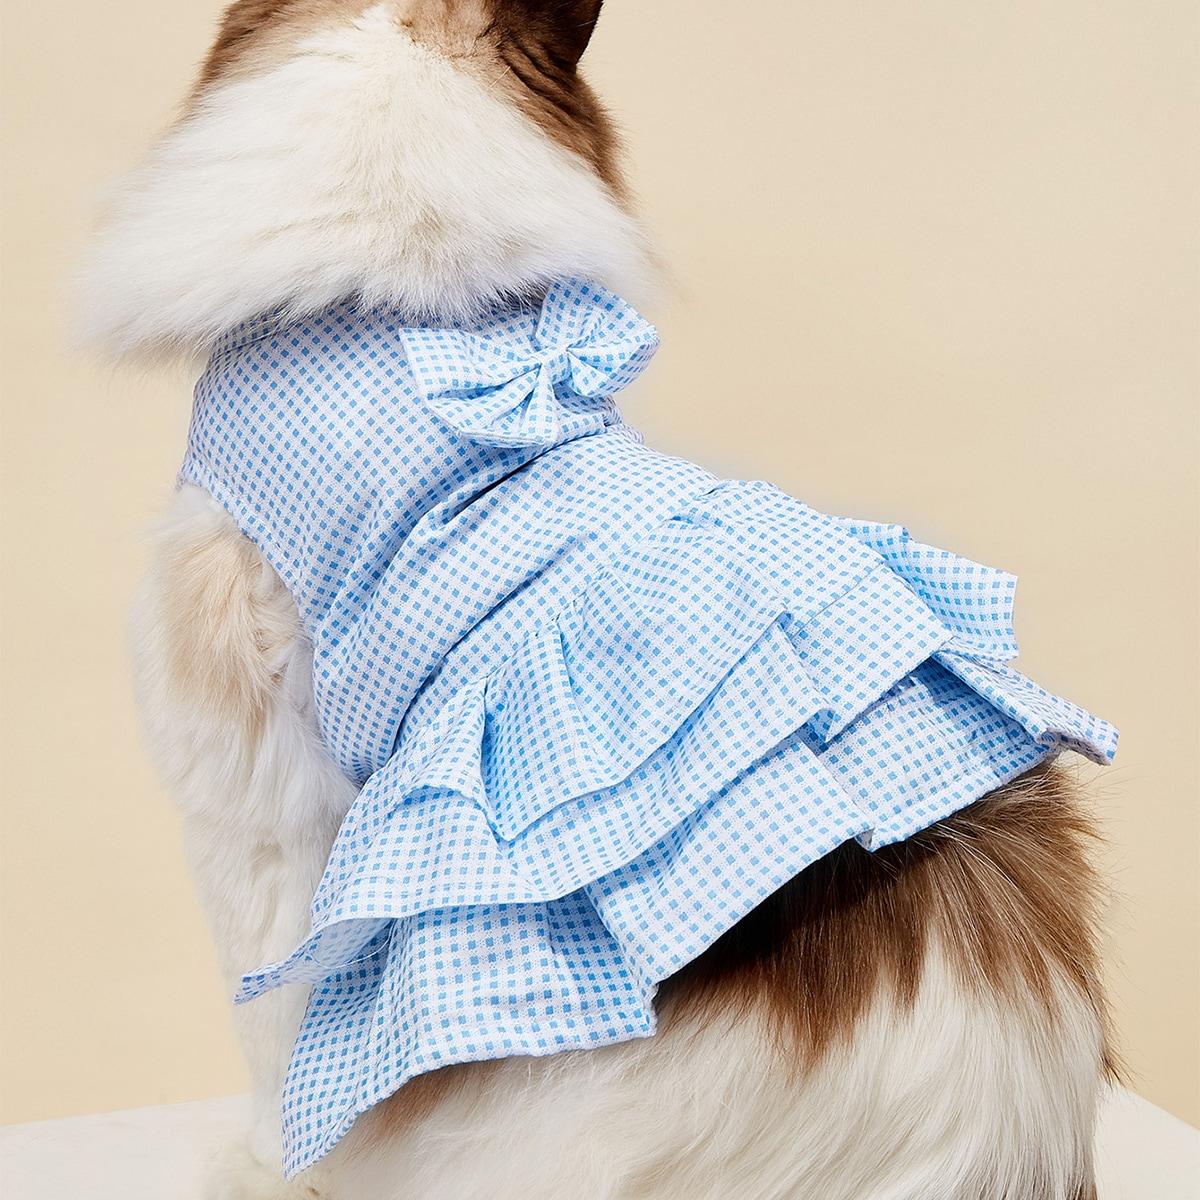 Bow Detail Plaid Ruffle Pet Dress